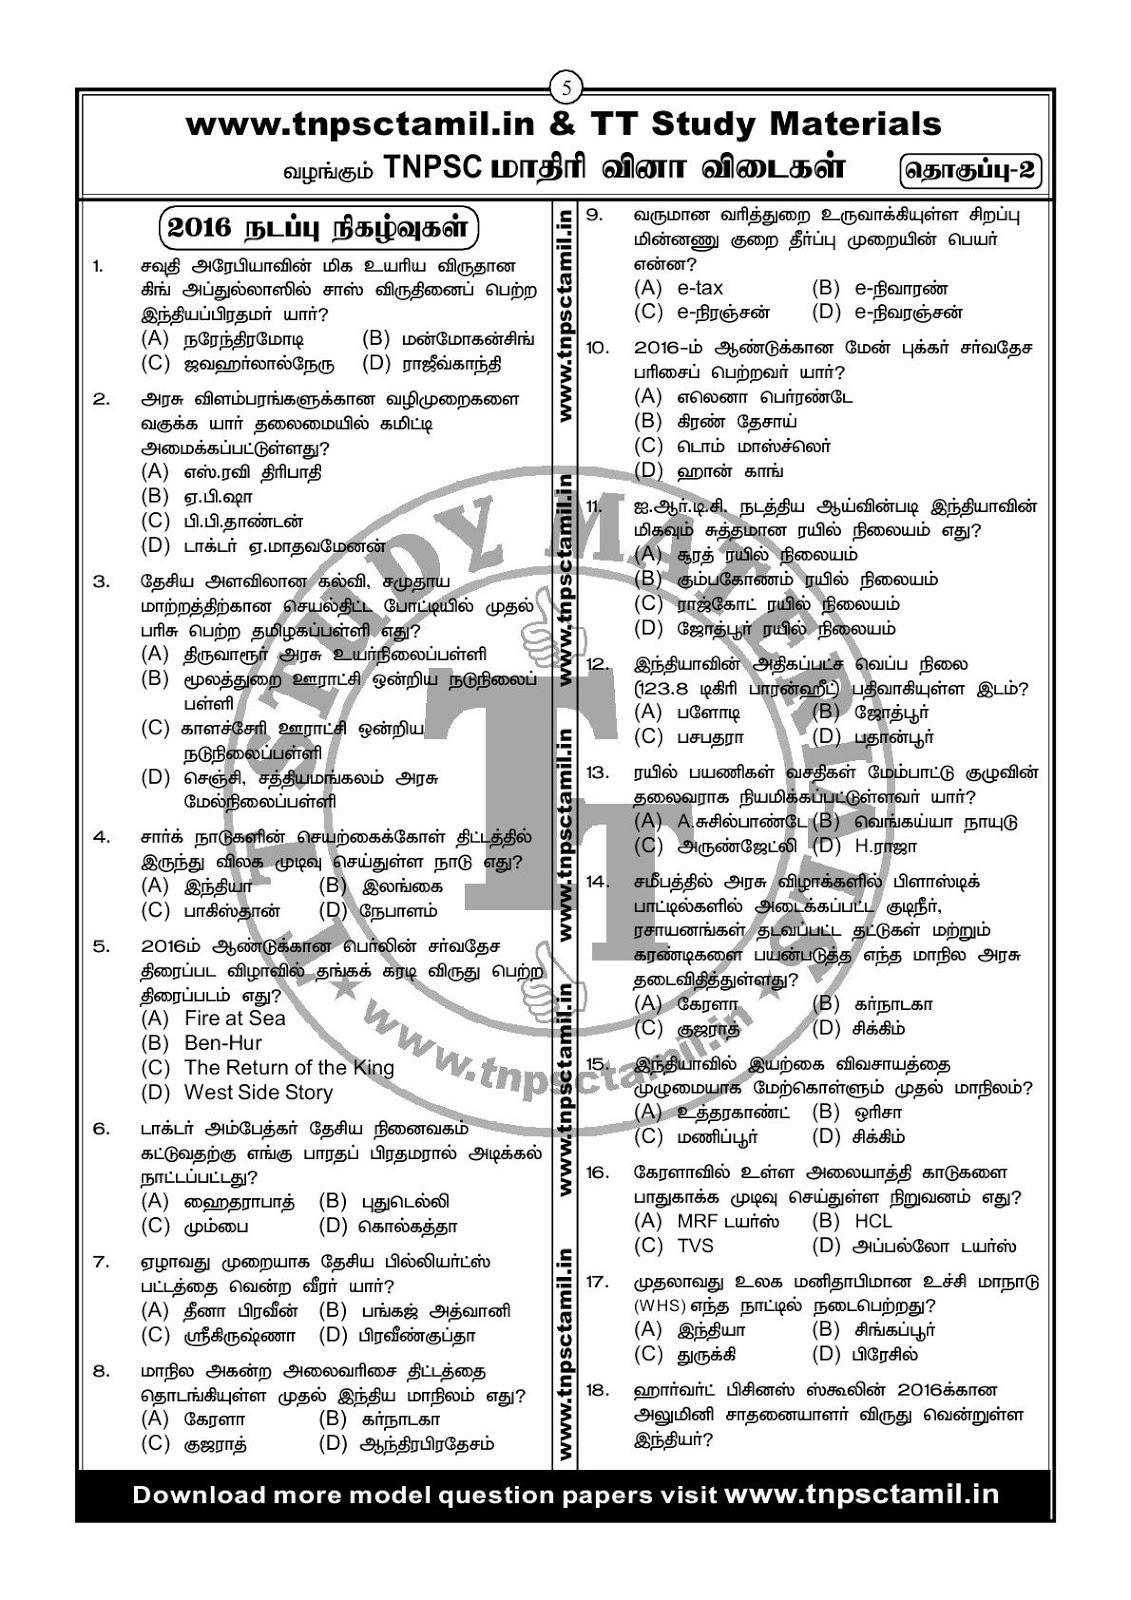 Study material in pdf 2015 tnpsc tamil